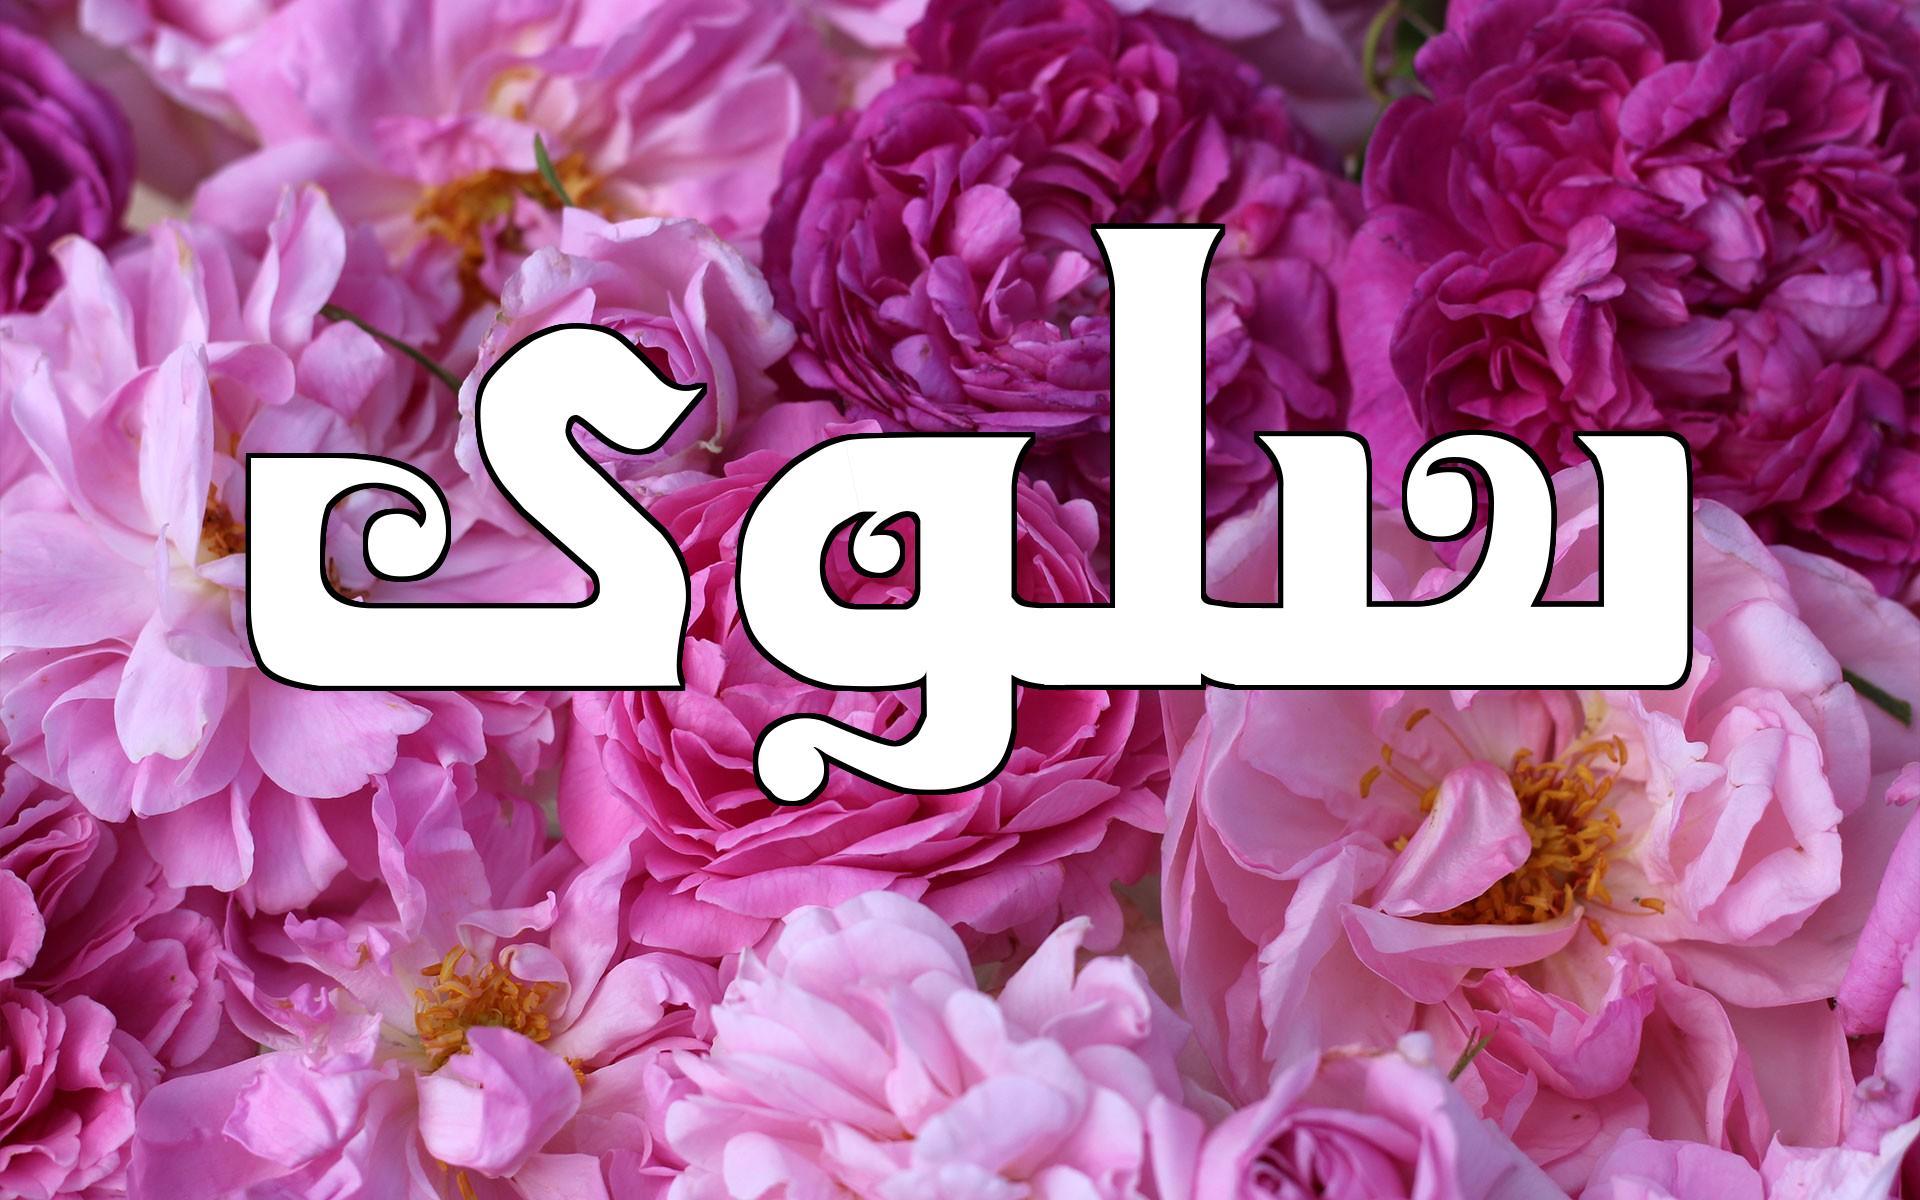 صور معنى اسم سلوى , تعرف على معنى اسم سلوى